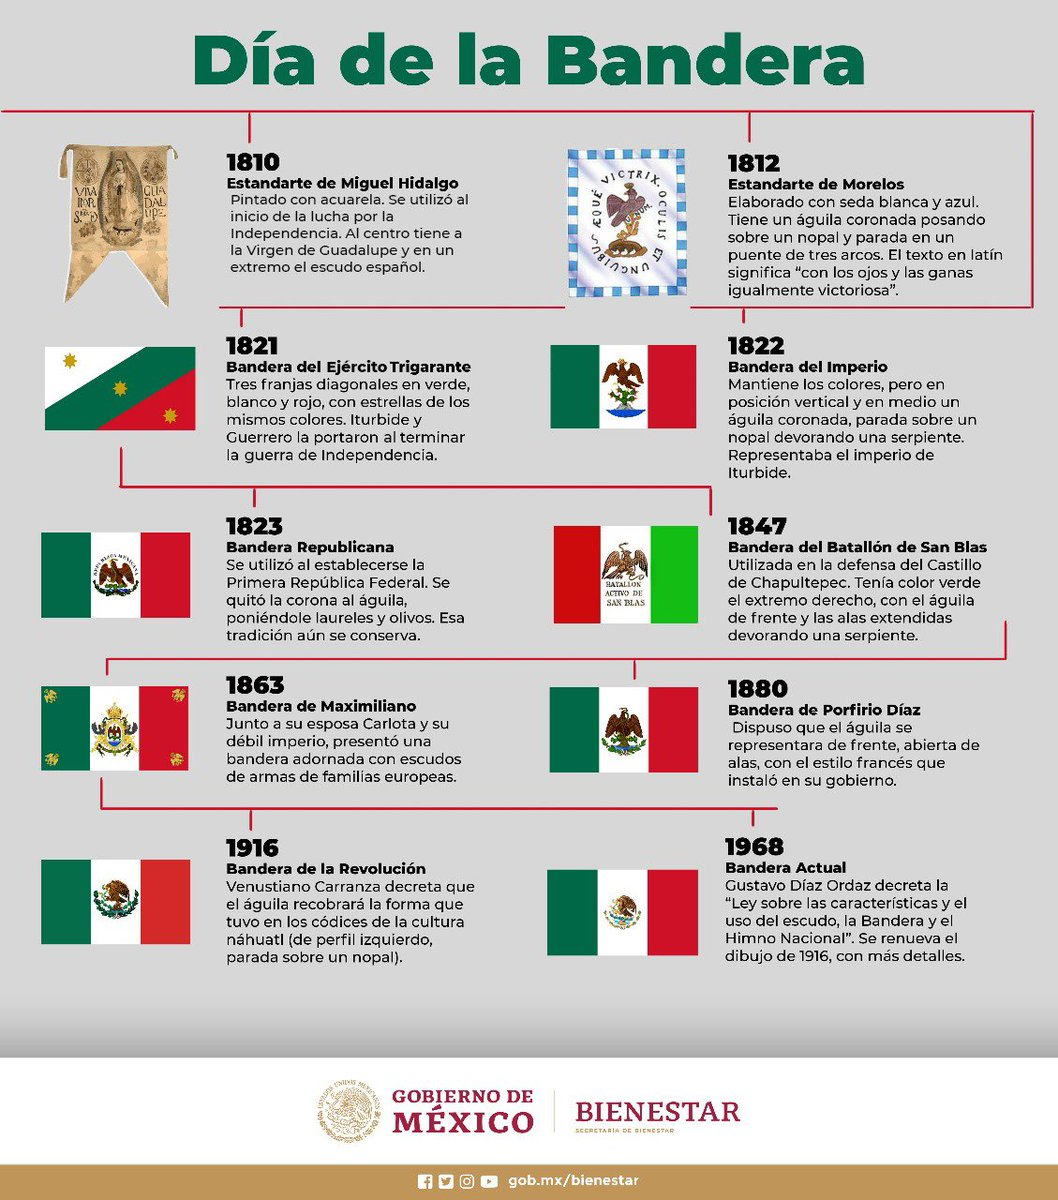 que significa el simbolo de la bandera mexicana